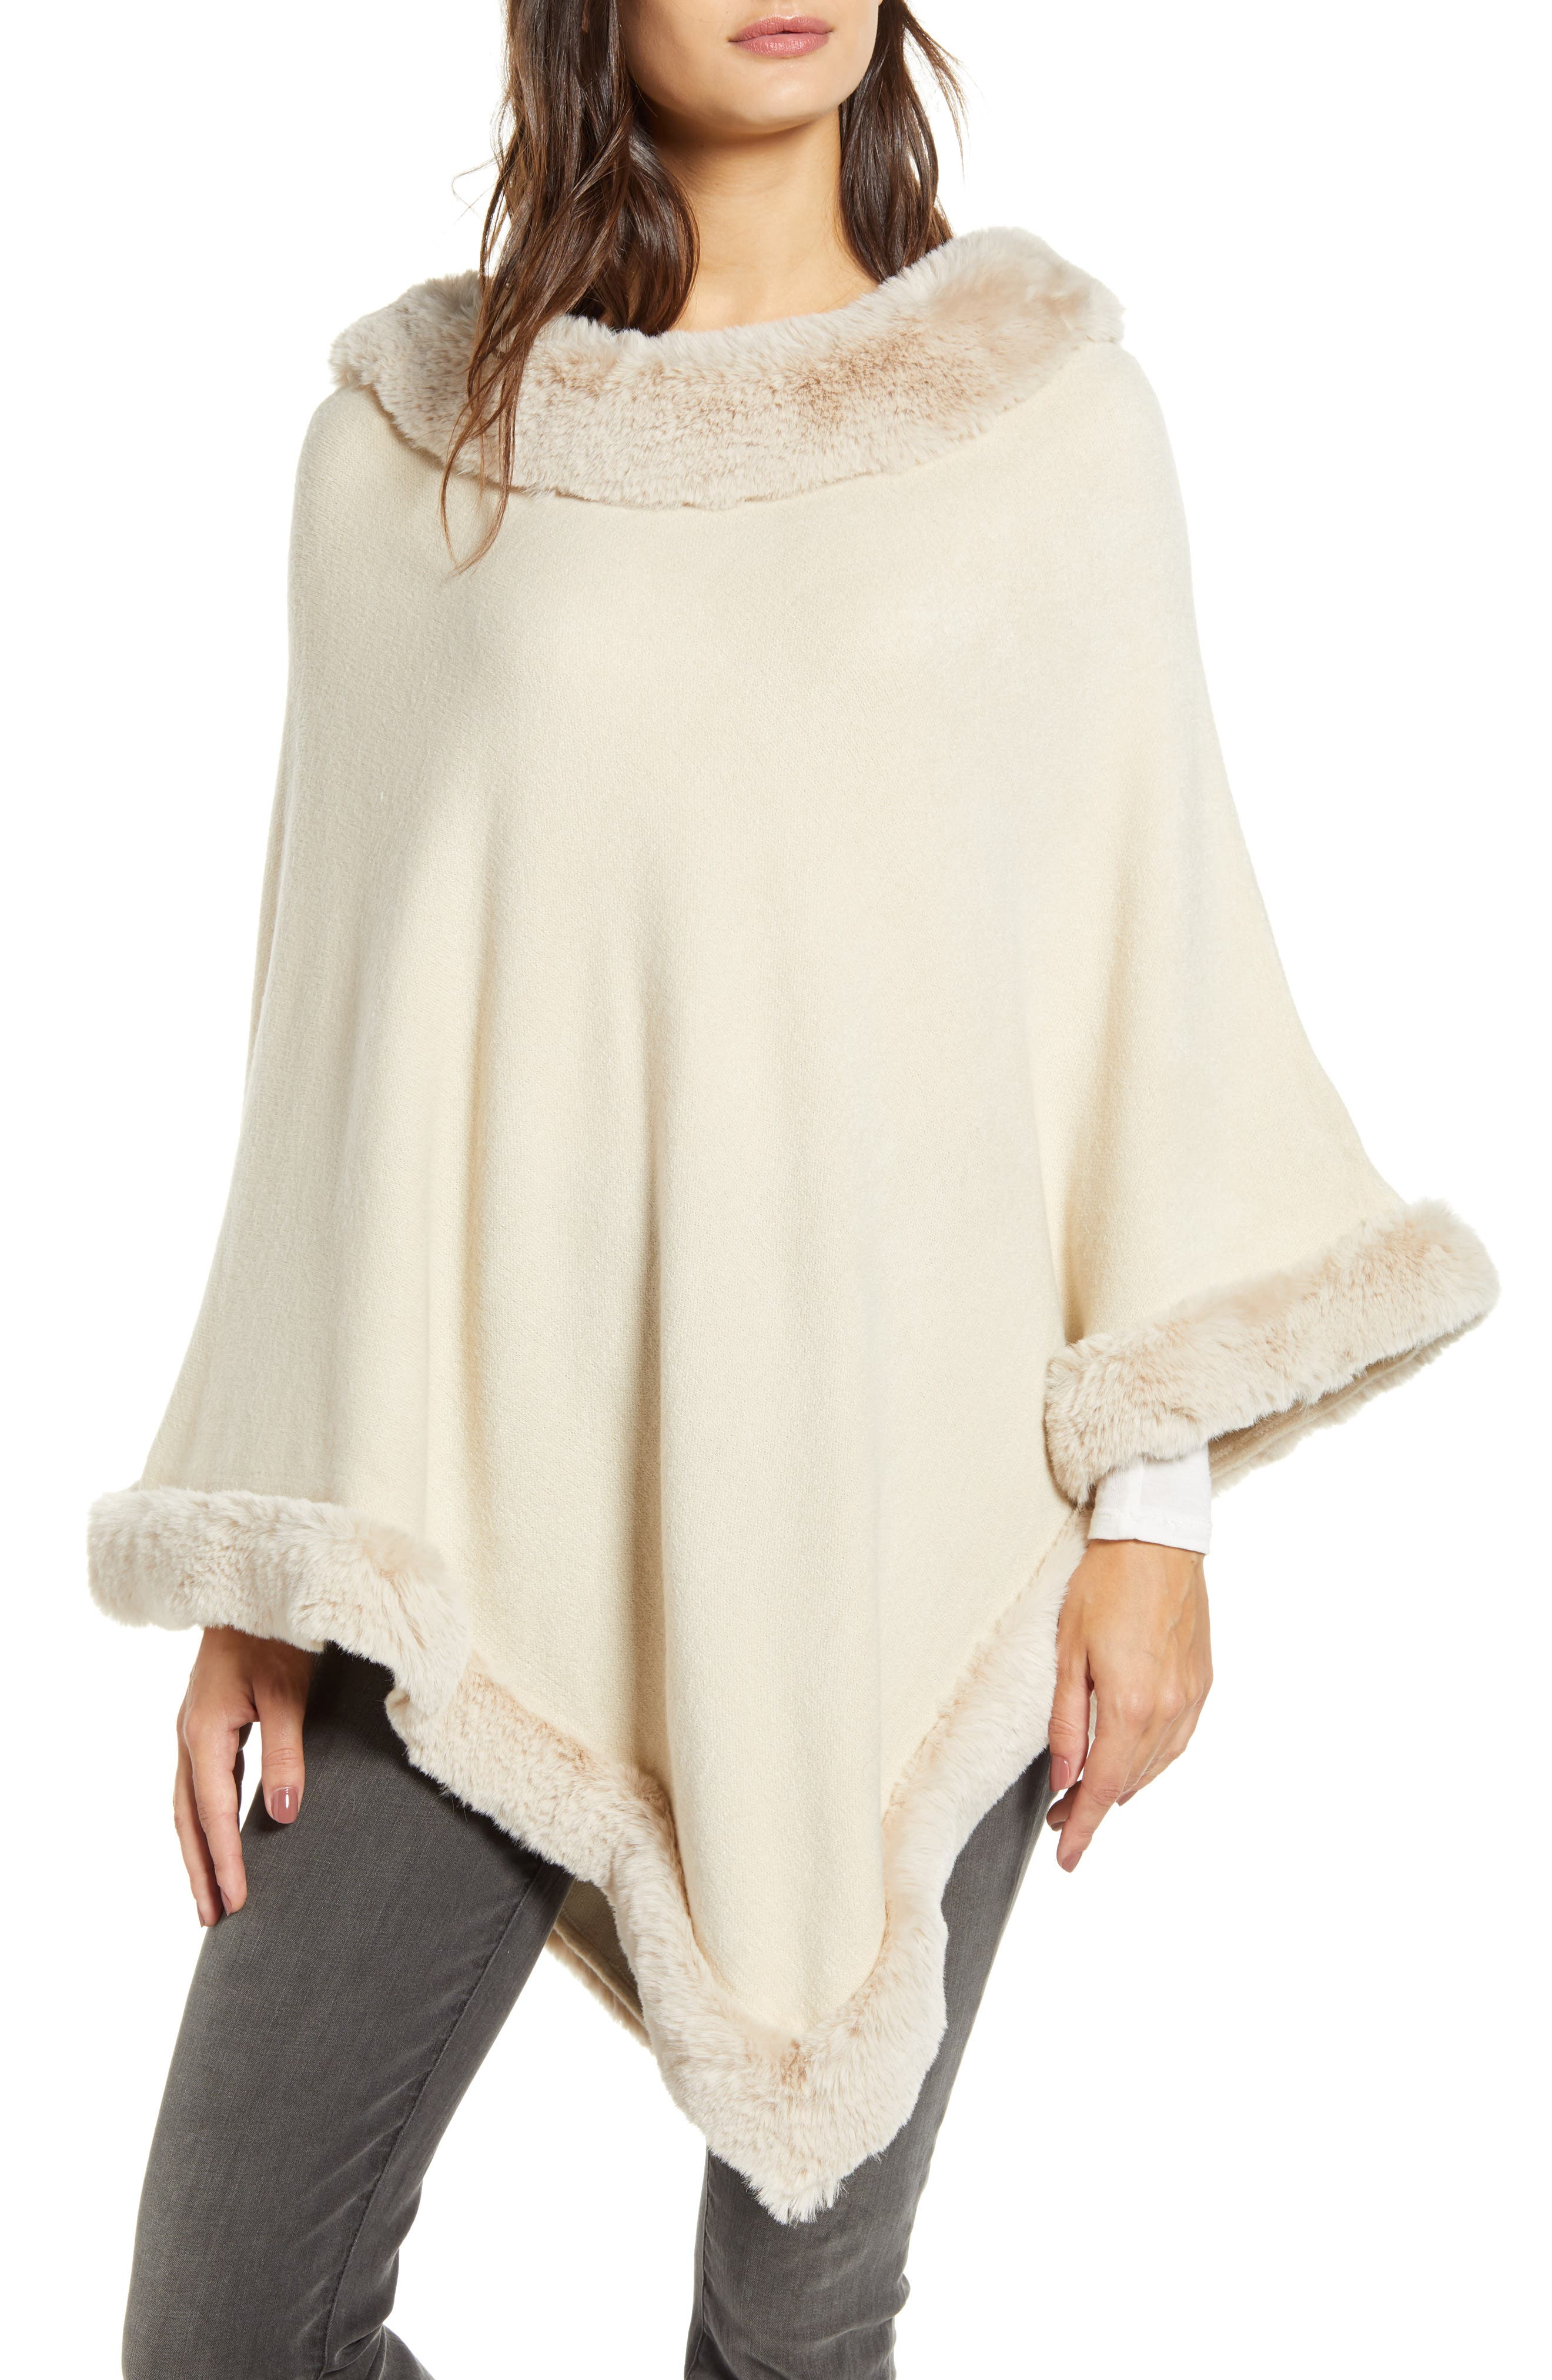 Victorian Capelet, Cape, Cloak, Shawl, Muff Womens Love Token Faux Fur Trim Poncho Size MediumLarge - Beige $135.00 AT vintagedancer.com